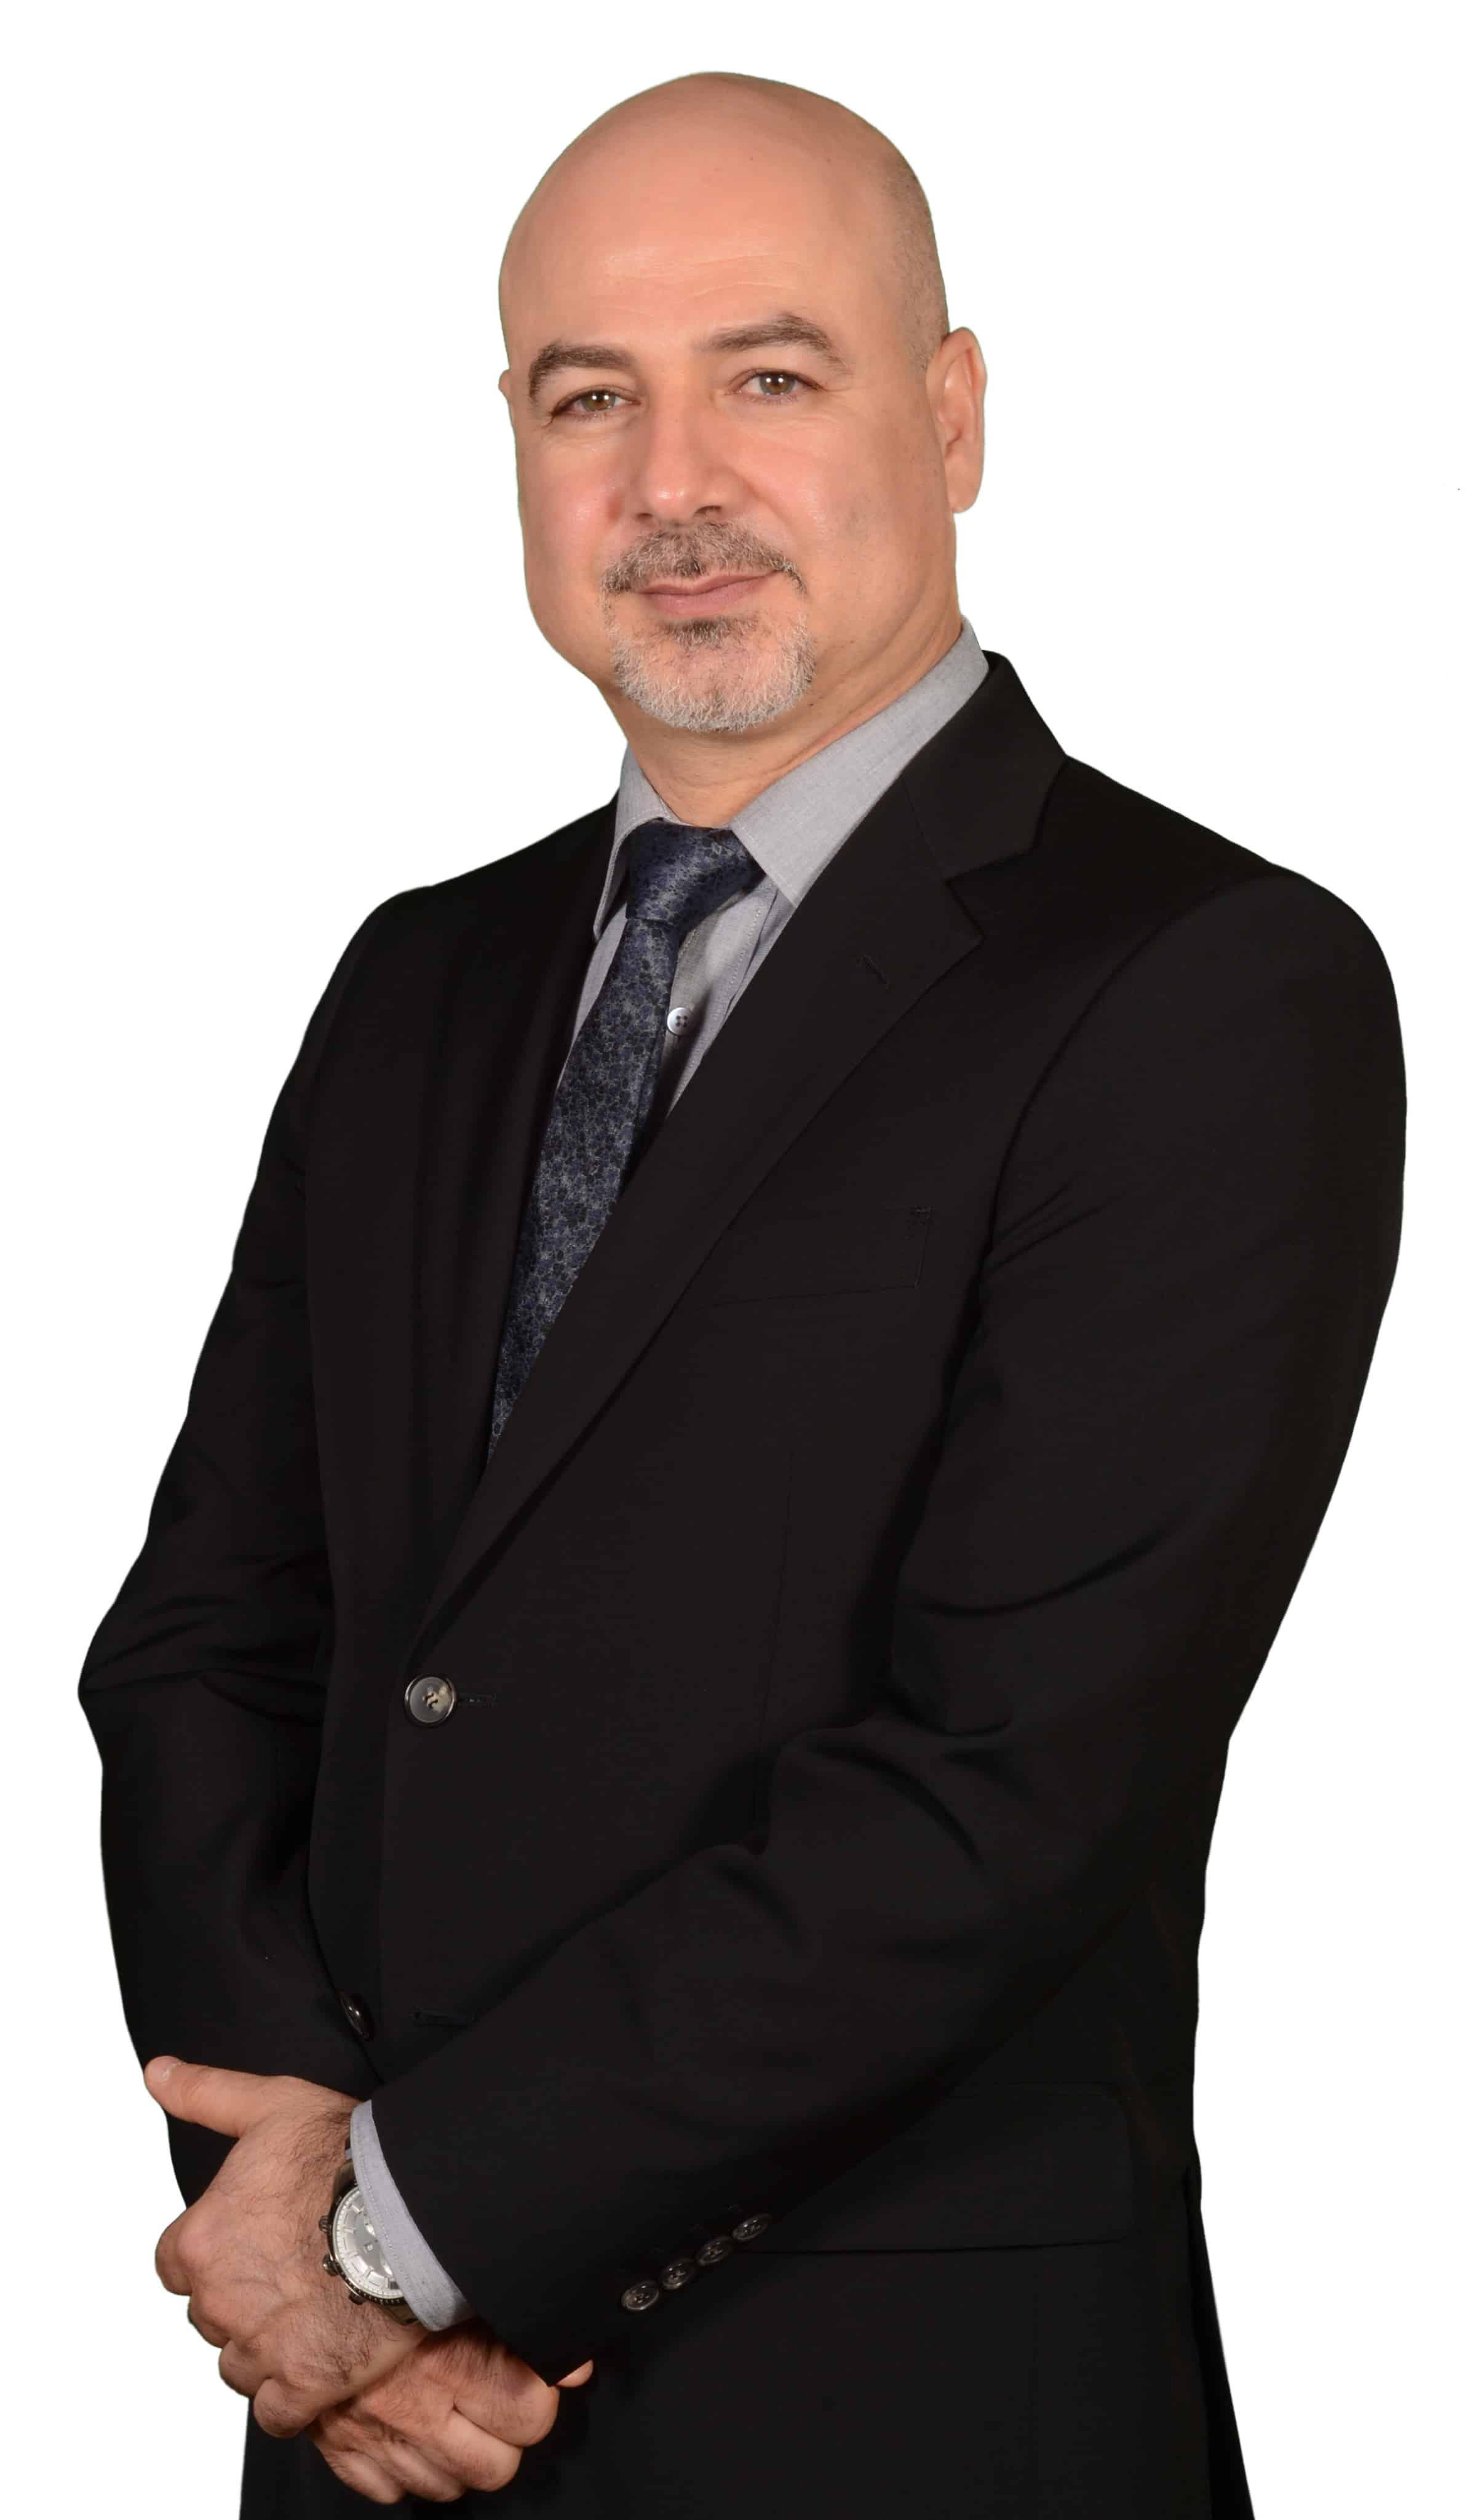 Dr. Mahmoud Abed Alhade Al Cheikh Ahmad